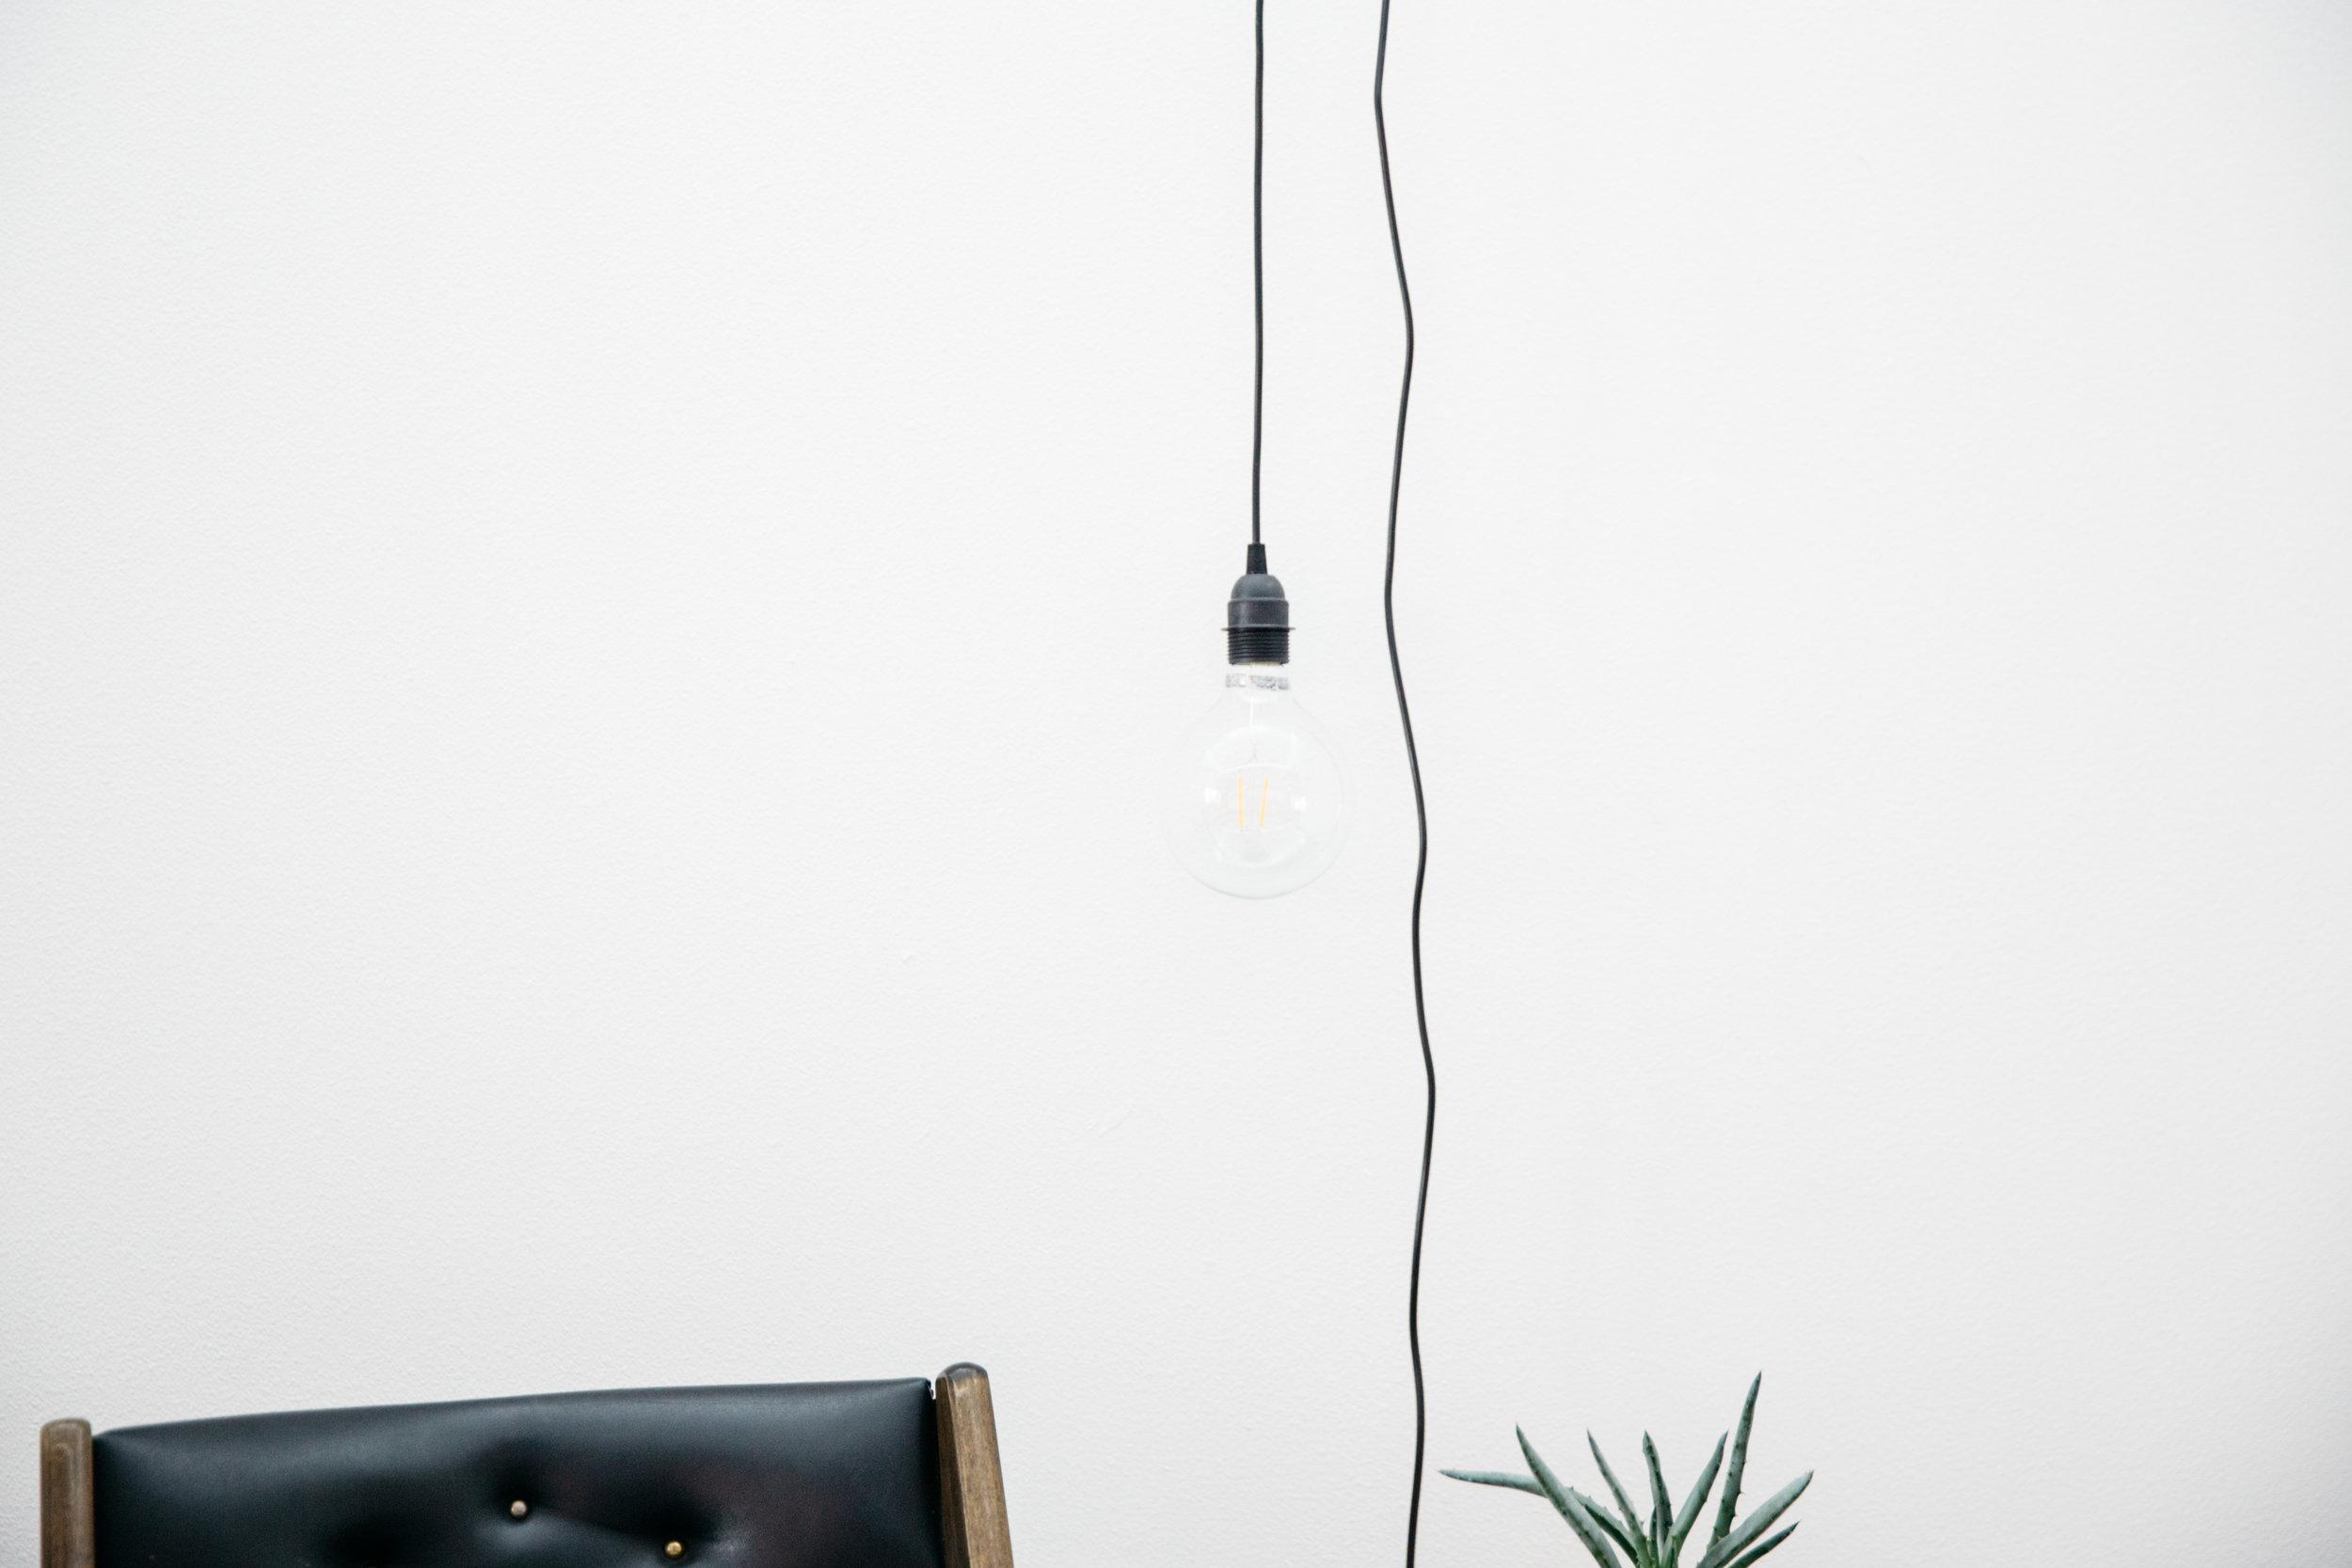 colorado-springs-photography-rental-studio-54.jpg